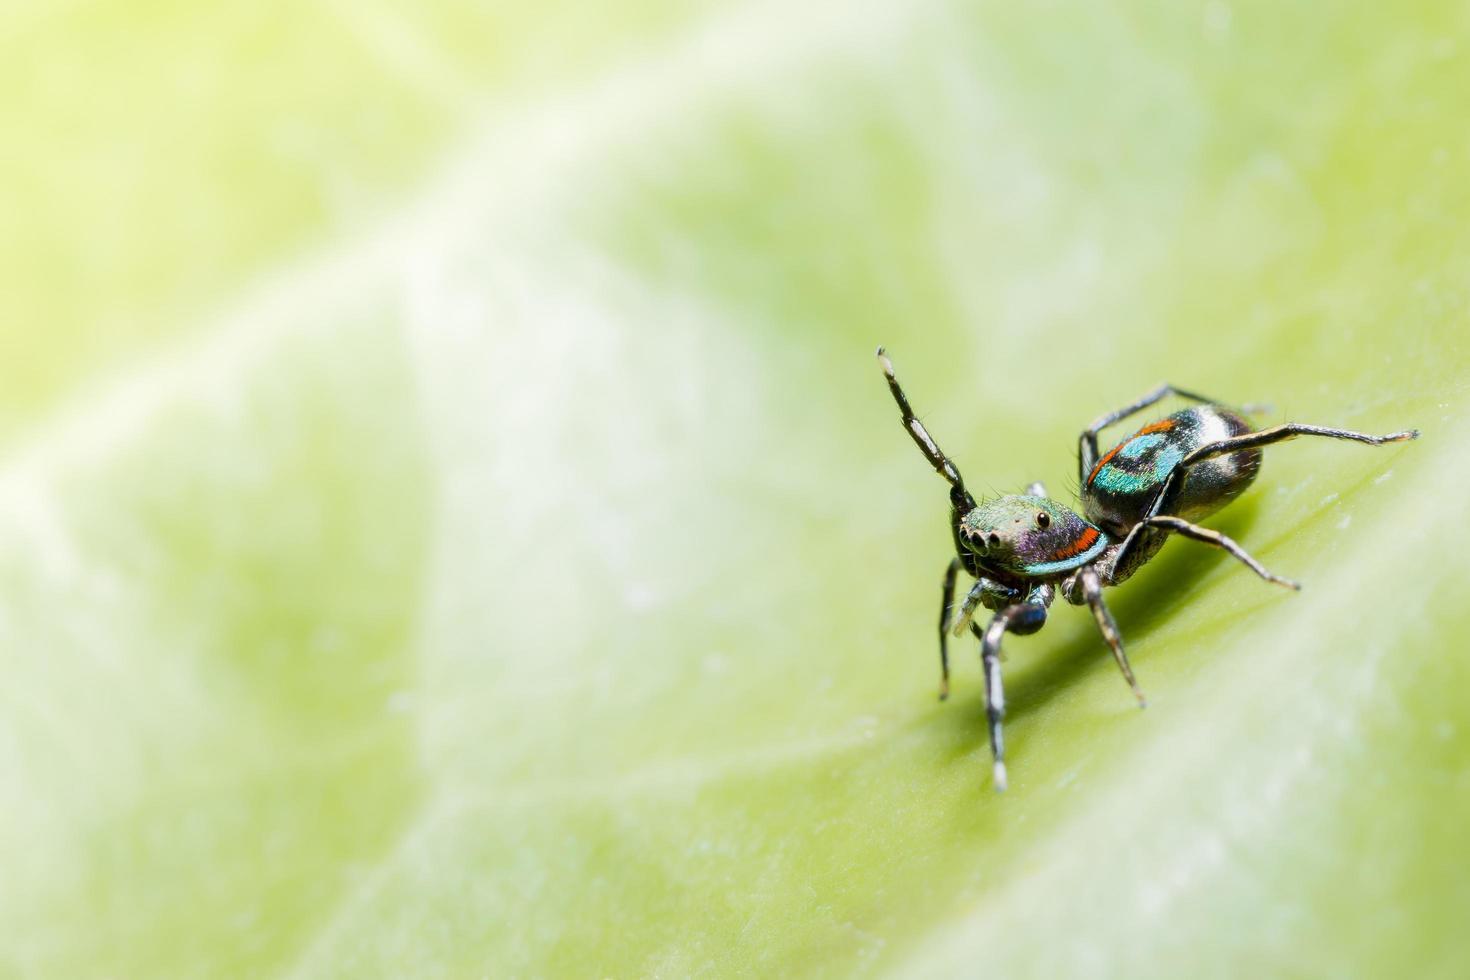 Spinne auf grünem Blatt foto